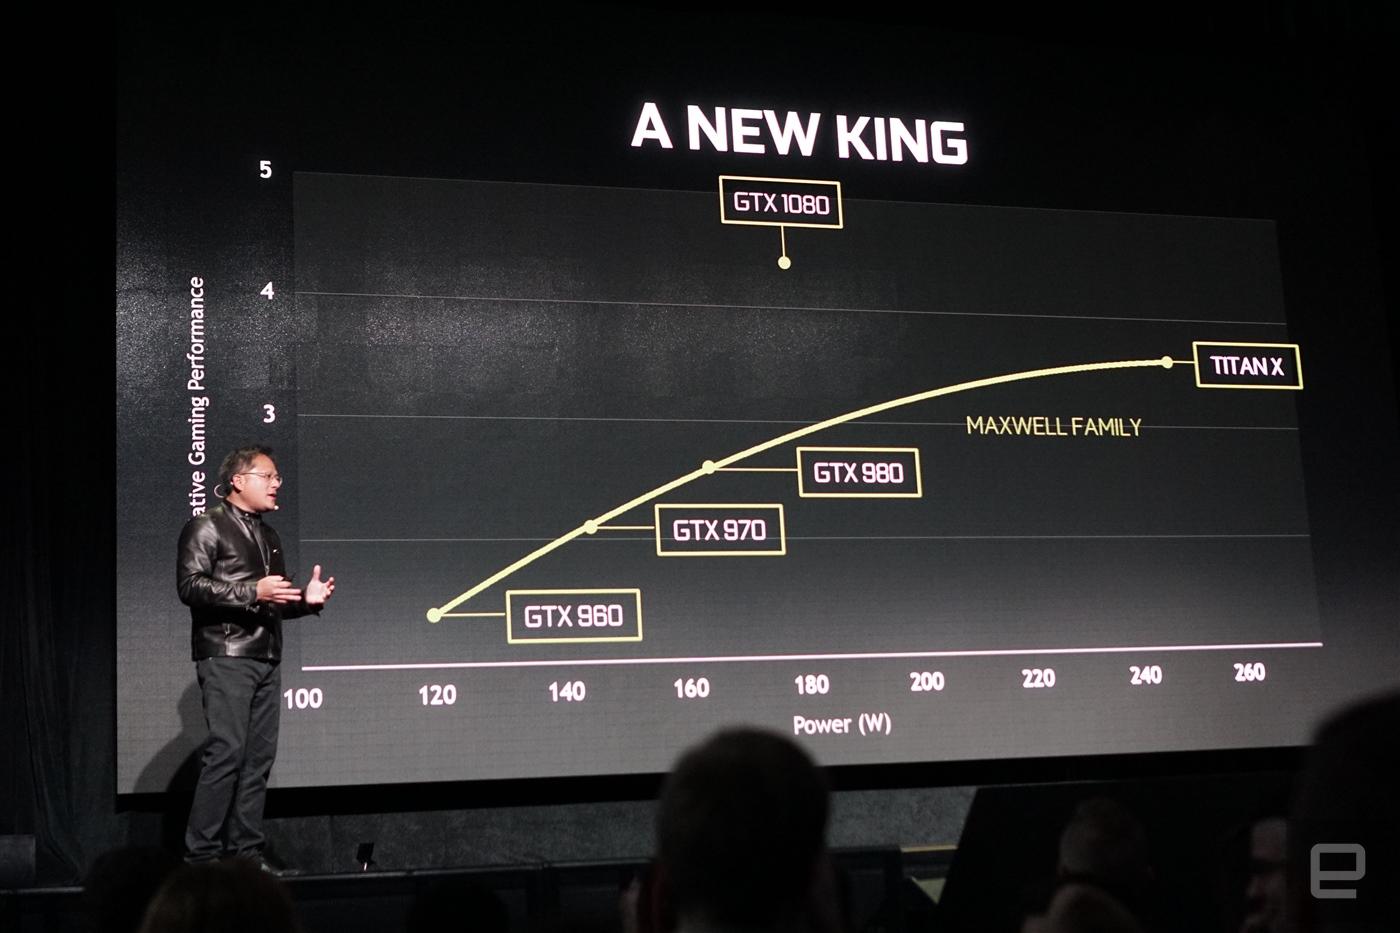 NVIDIA 新推 GTX 1080 显卡,5 月 27 日开卖